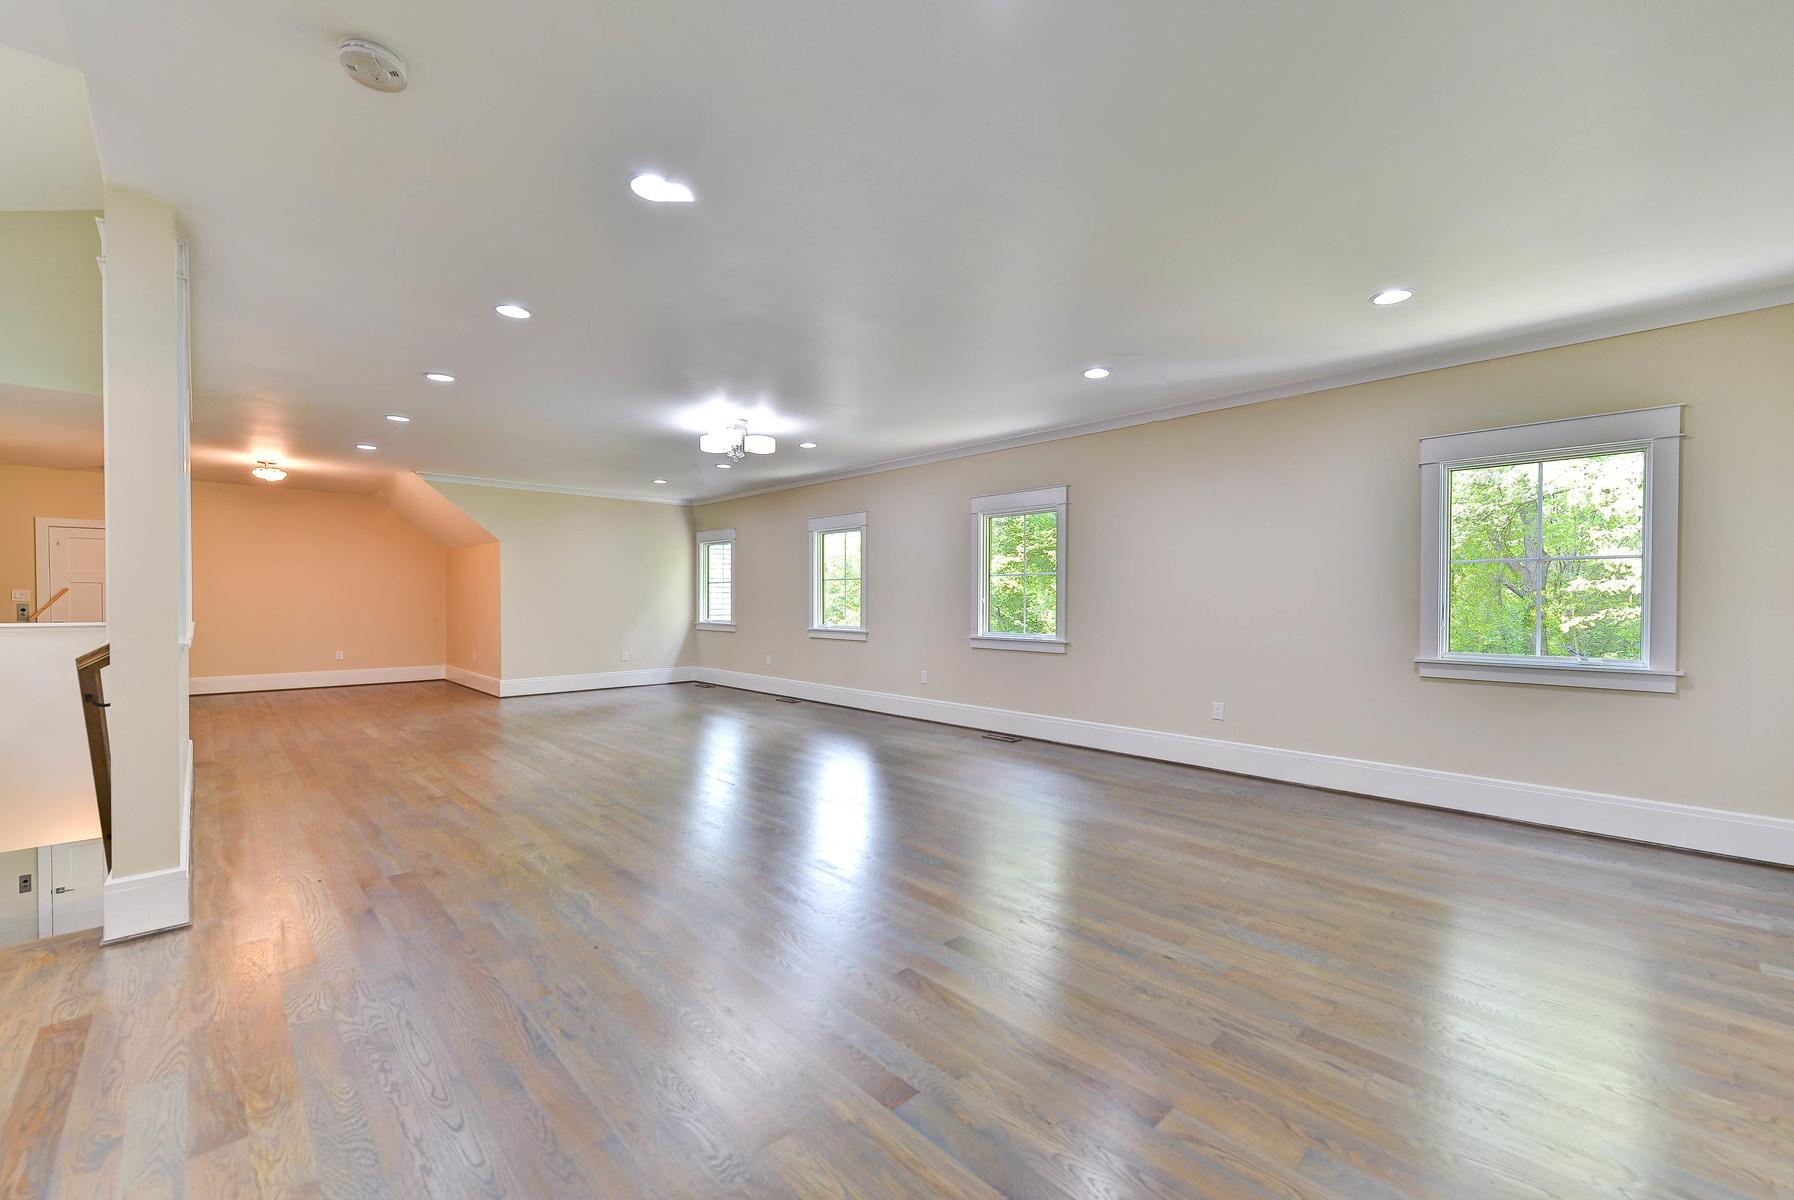 Additional photo for property listing at Langley Forest 6828 Sorrel St McLean, Virginia 22101 Verenigde Staten